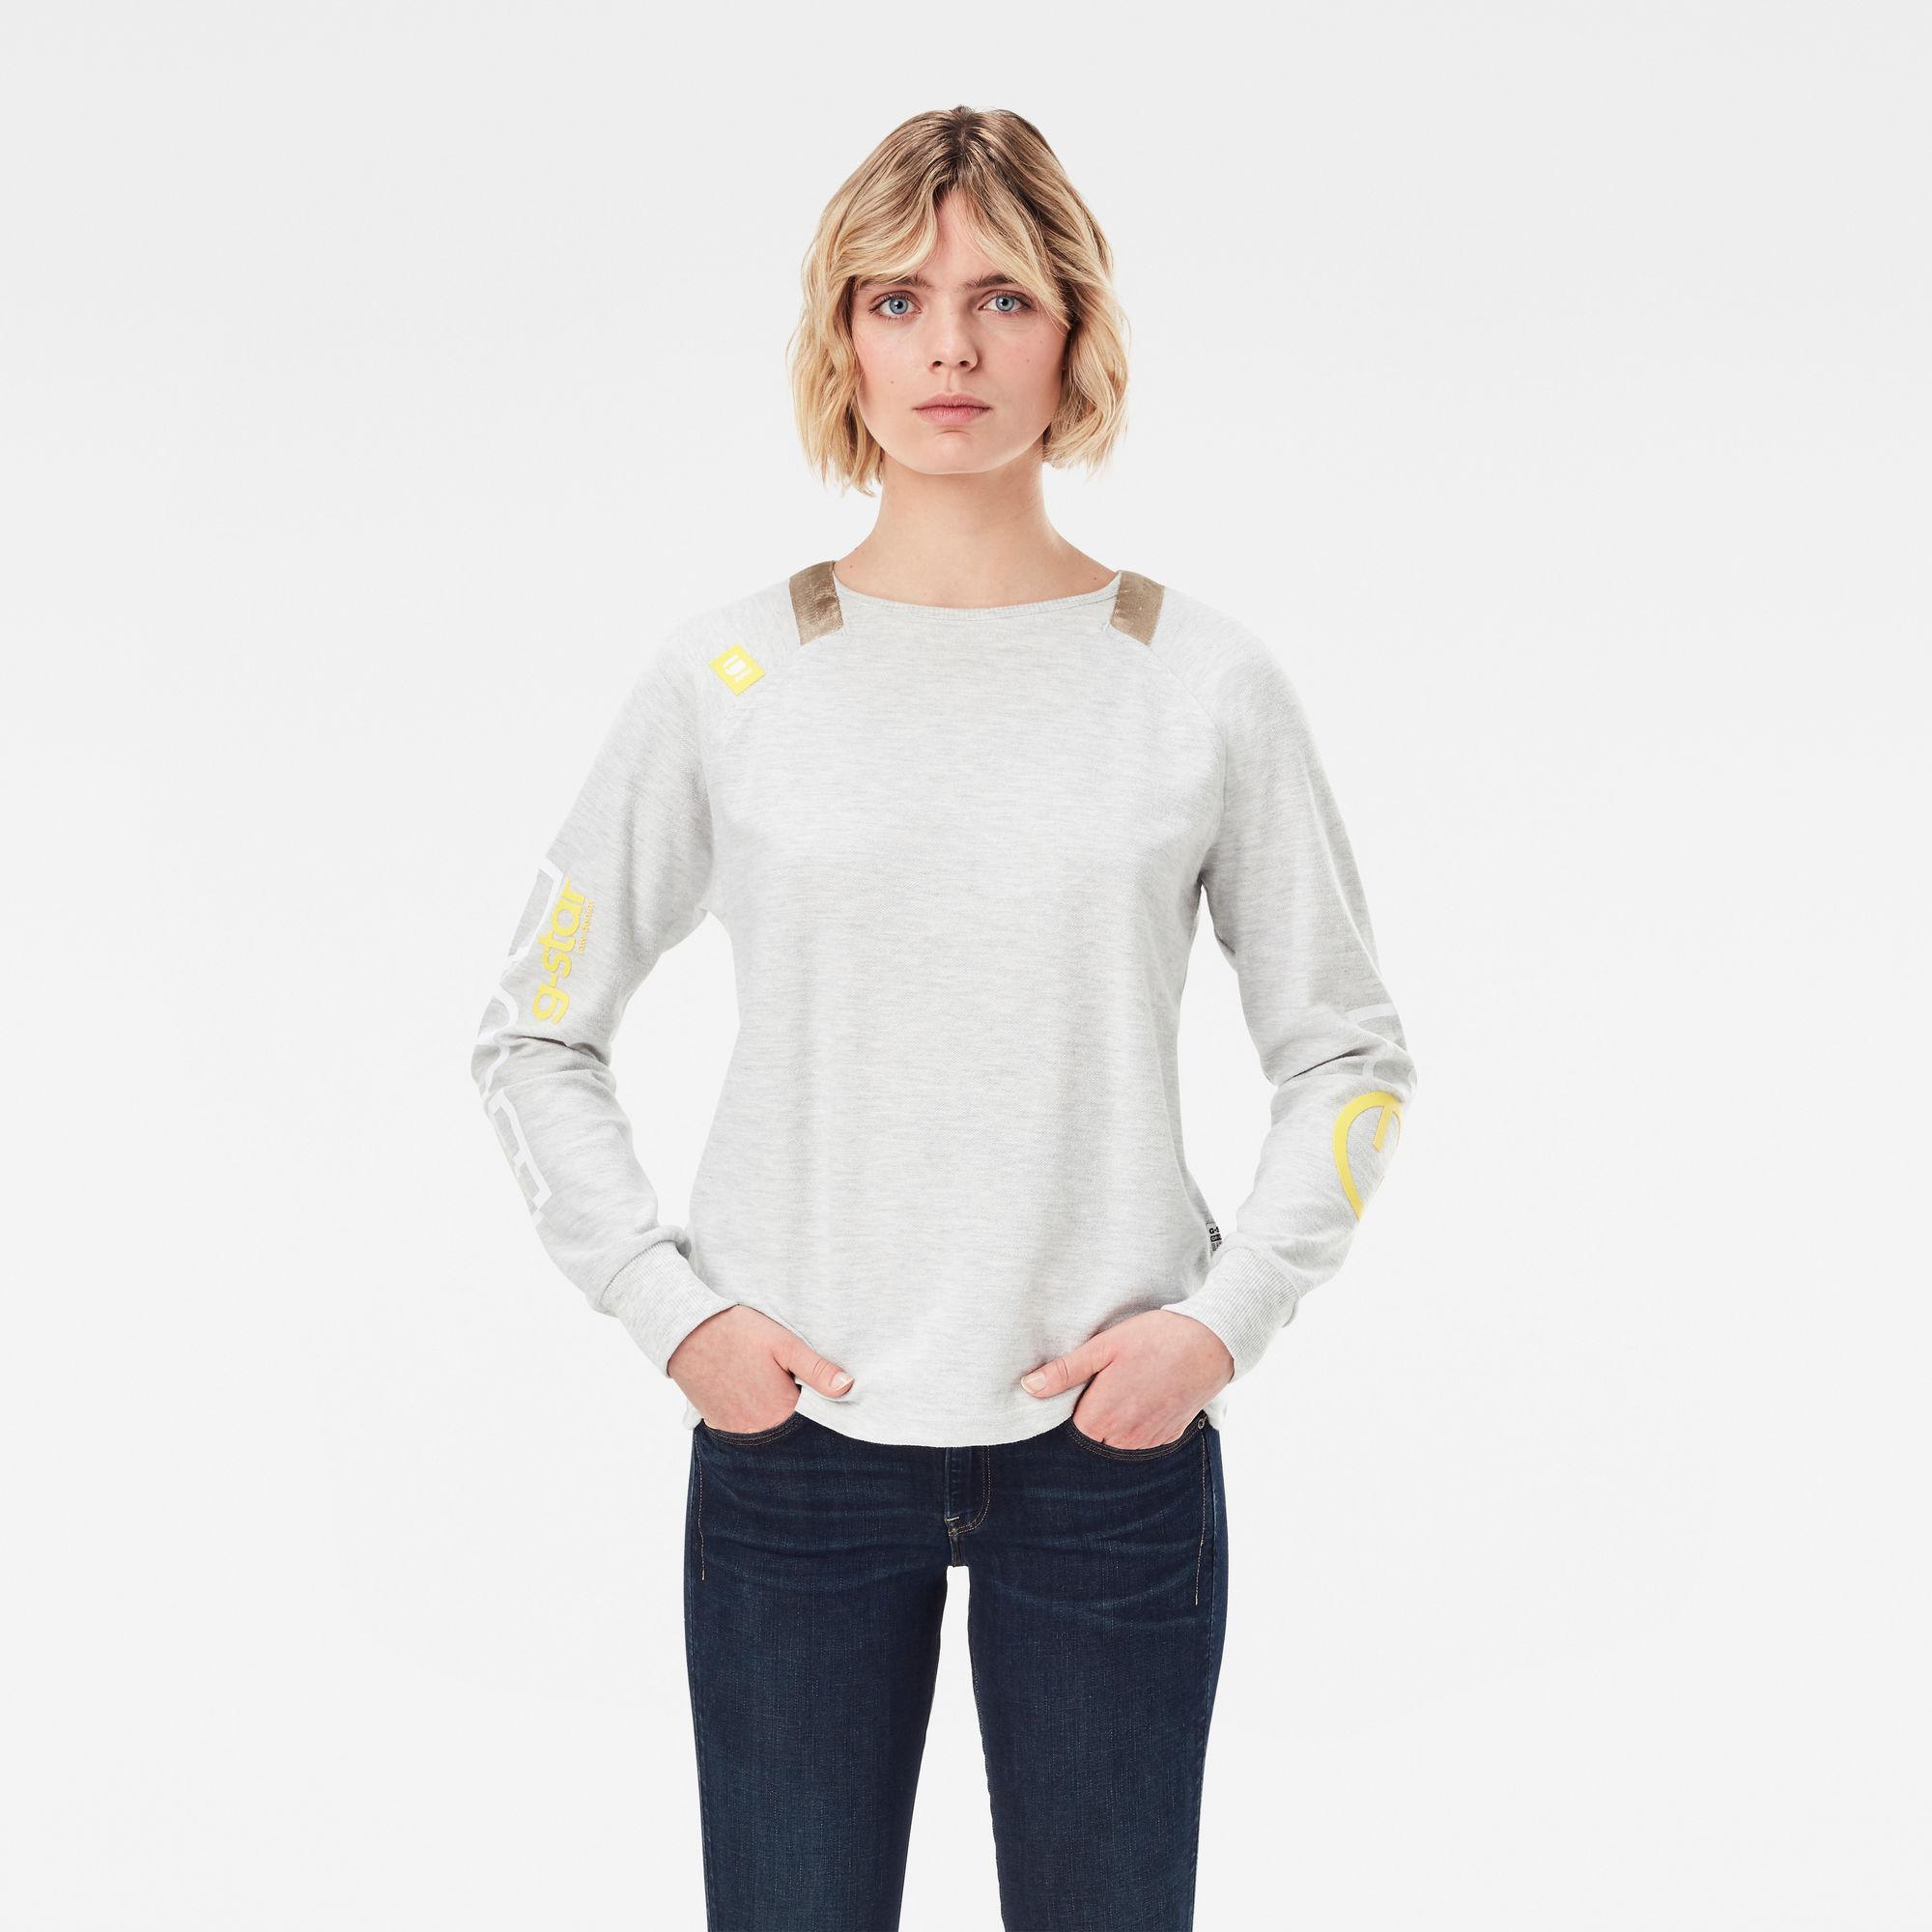 G-Star RAW Dames Sleeve Print Tweater Beige